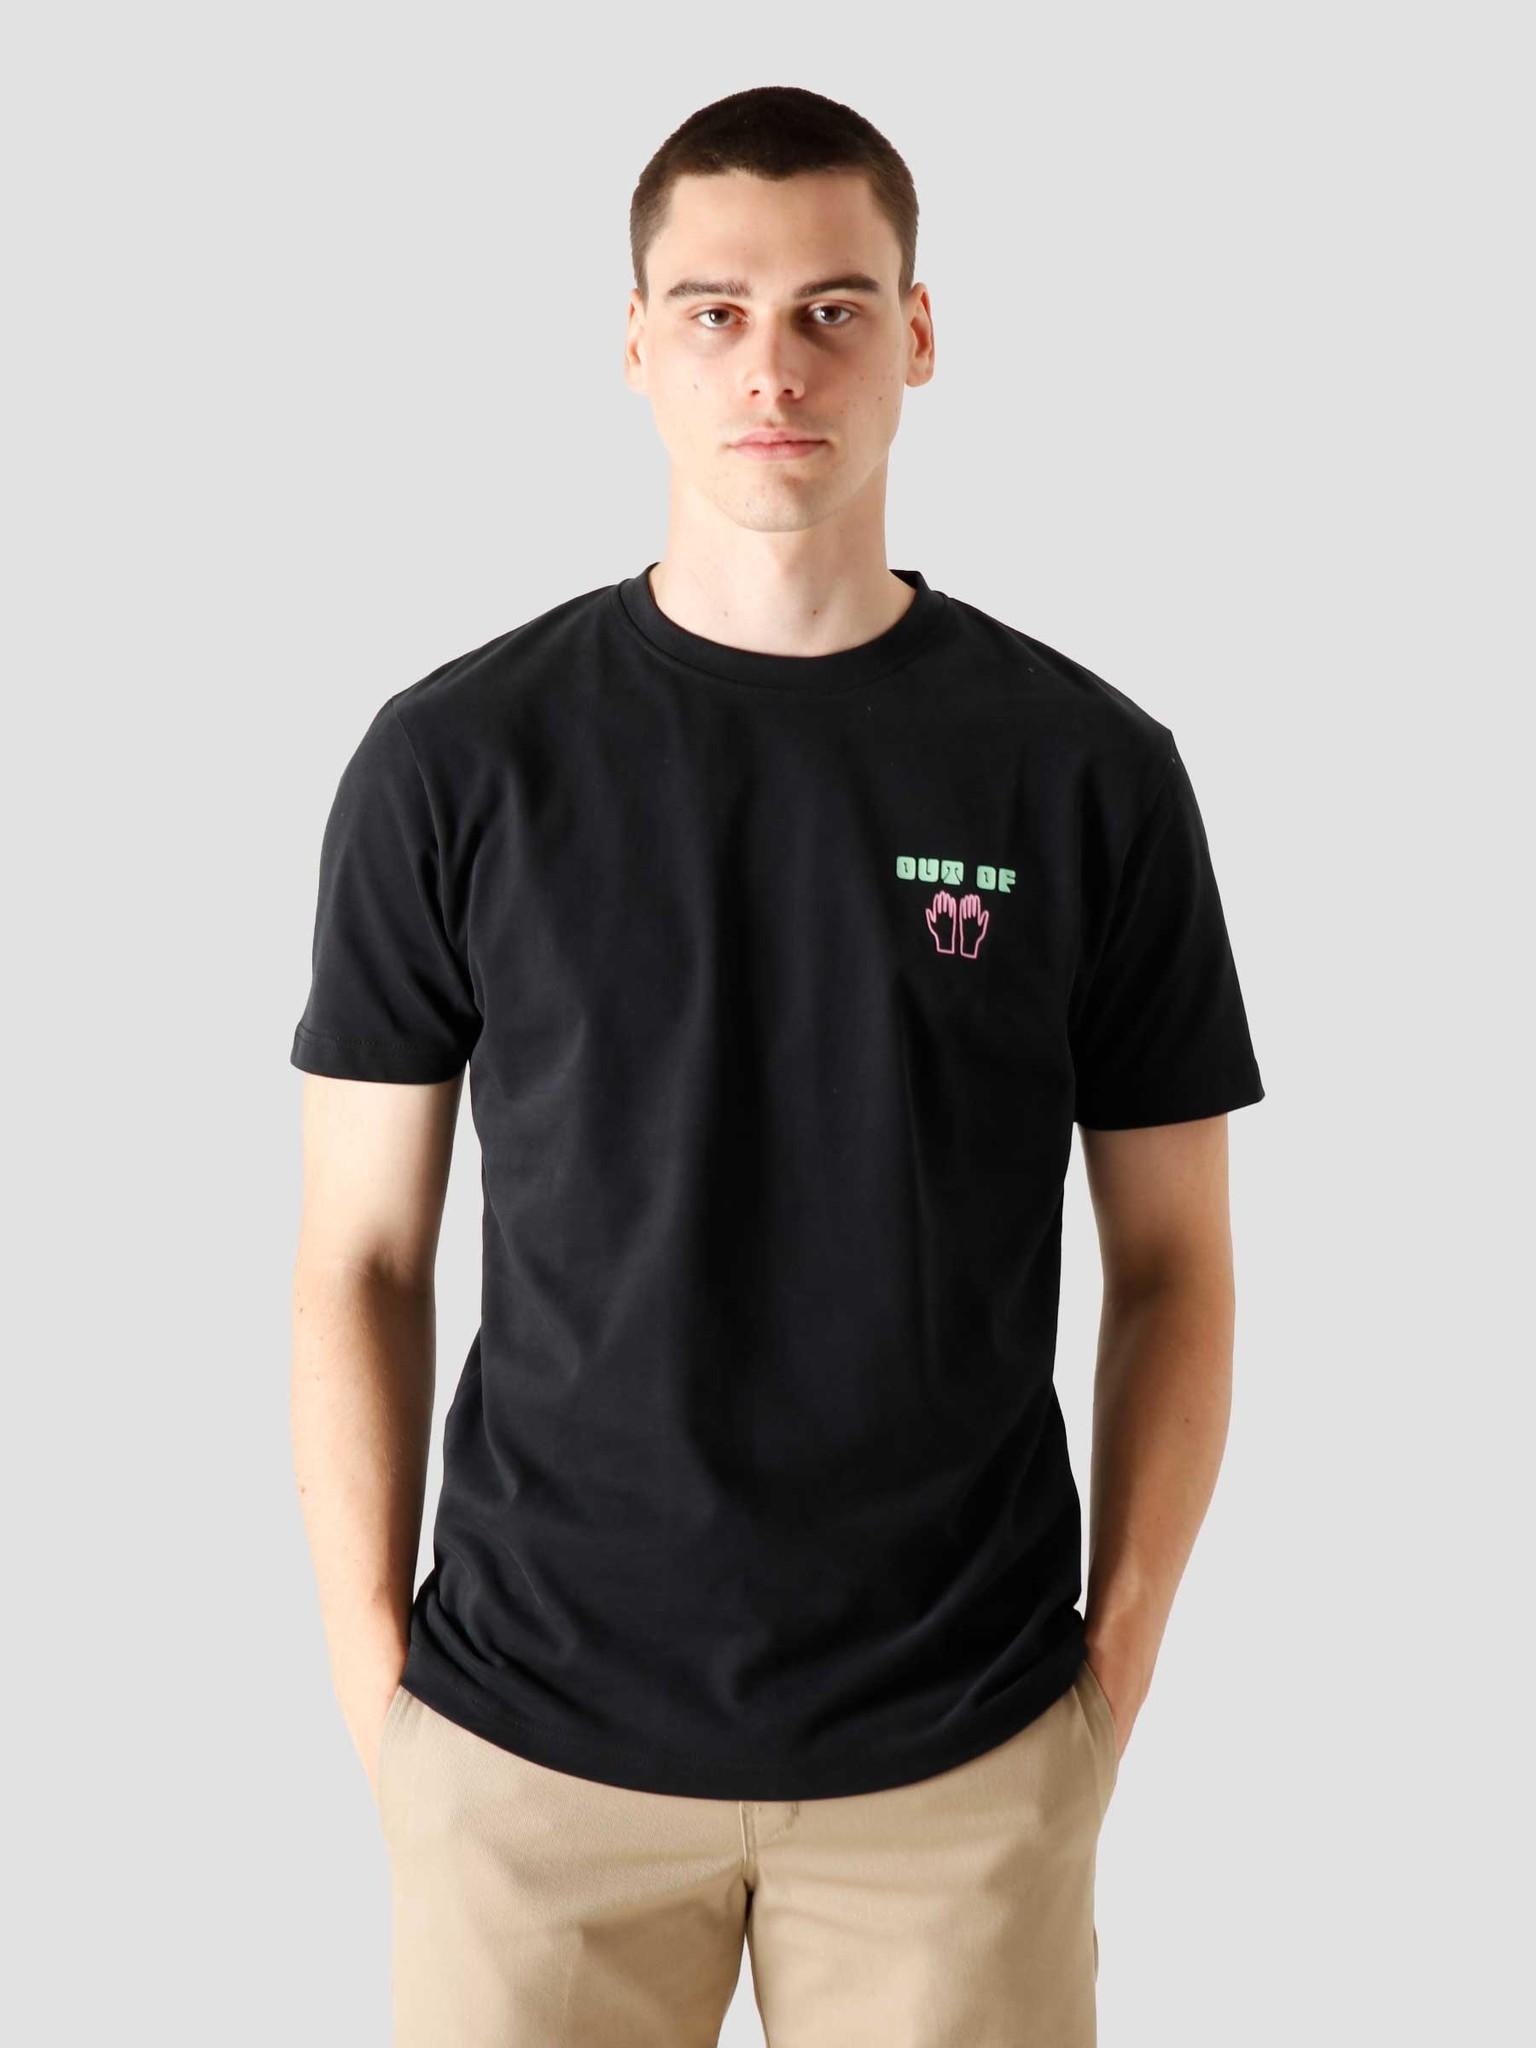 FRESHCOTTON FreshCotton Out Of Hand T-shirt Black